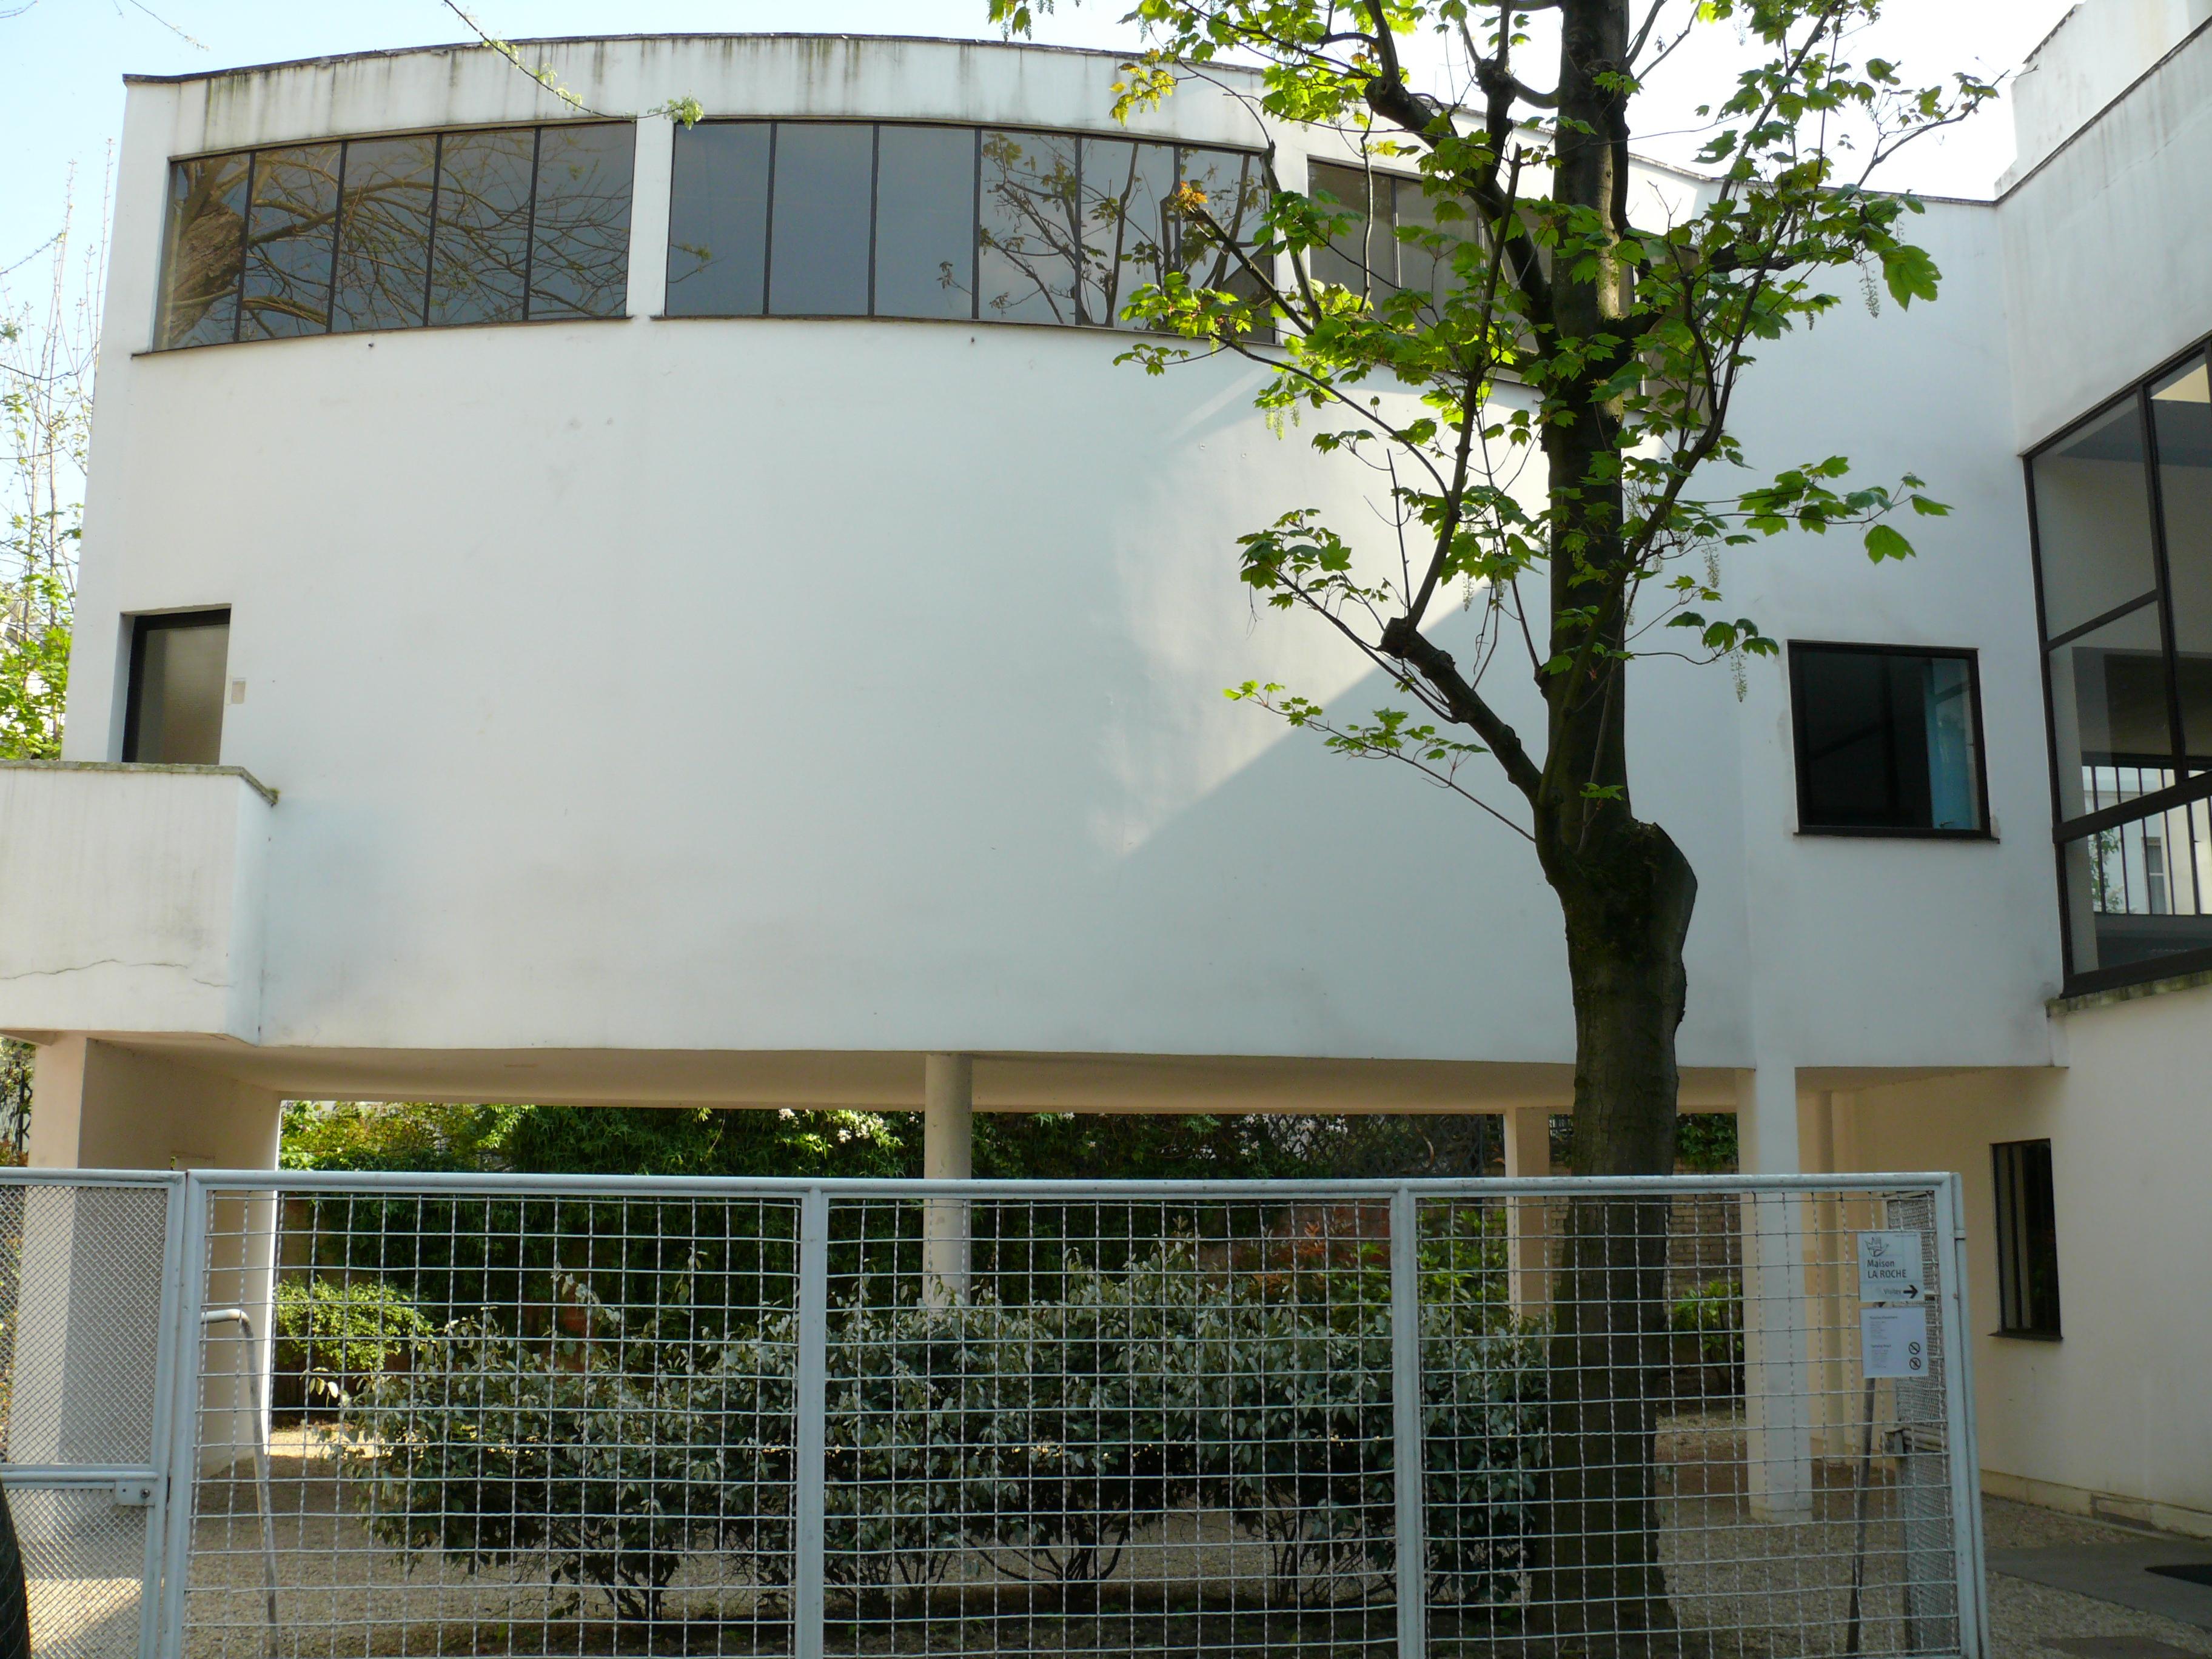 Maison La Roche Corbusier Paris maison la roche — wikipédia